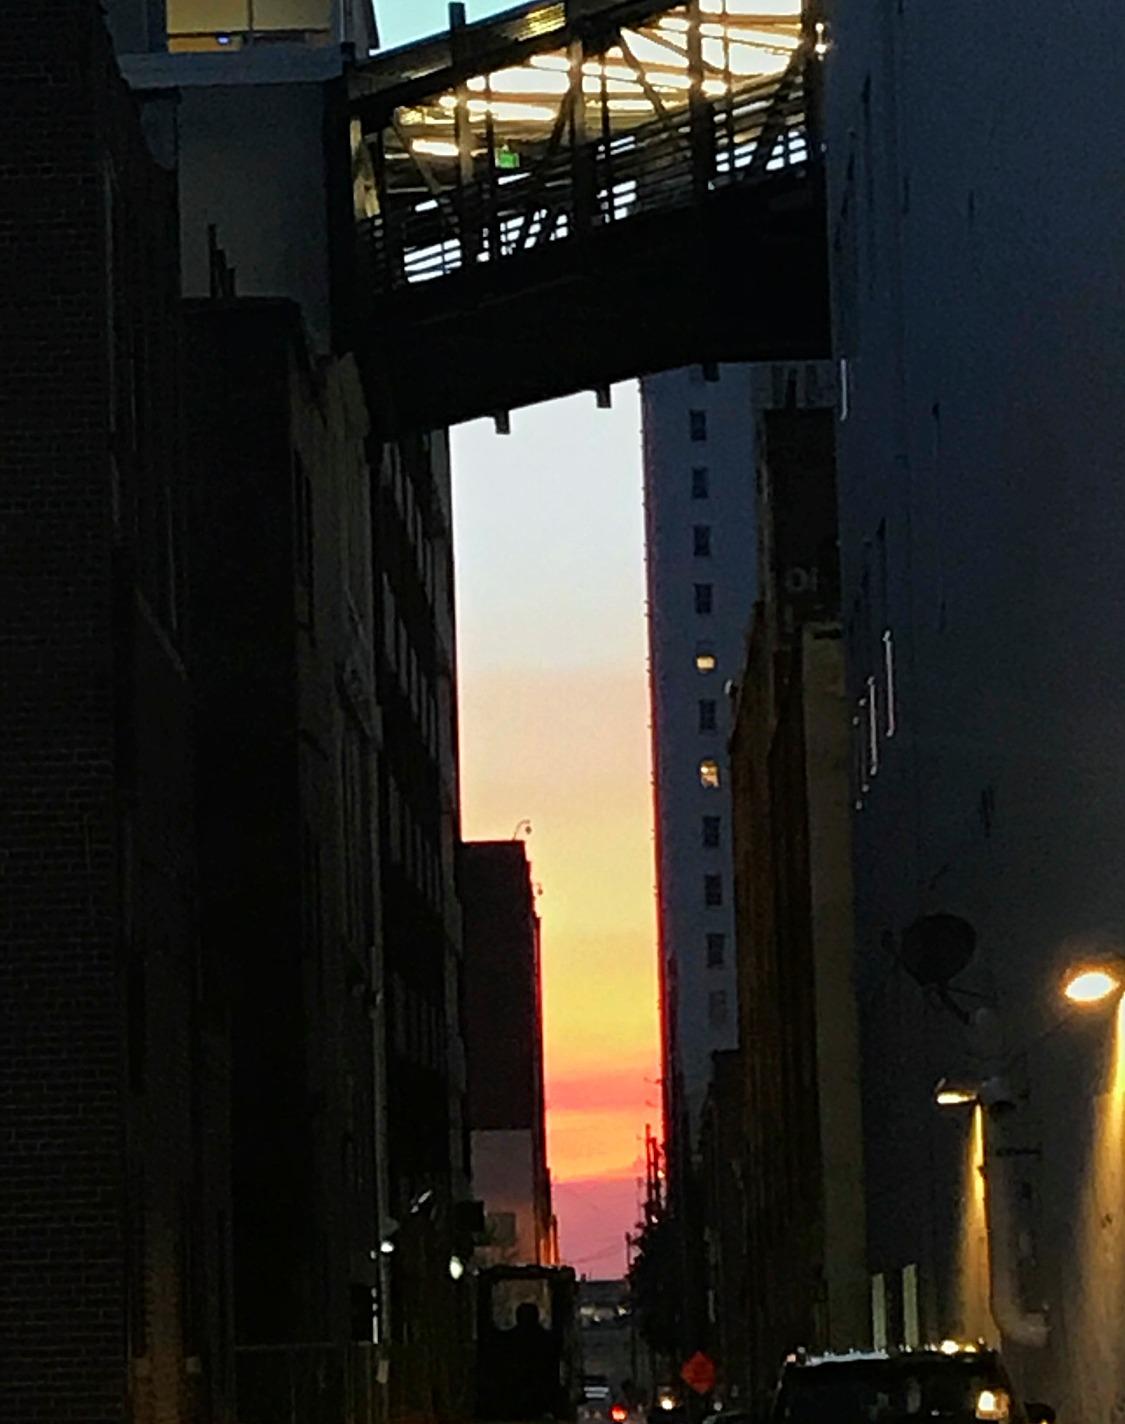 Sunset through Alley